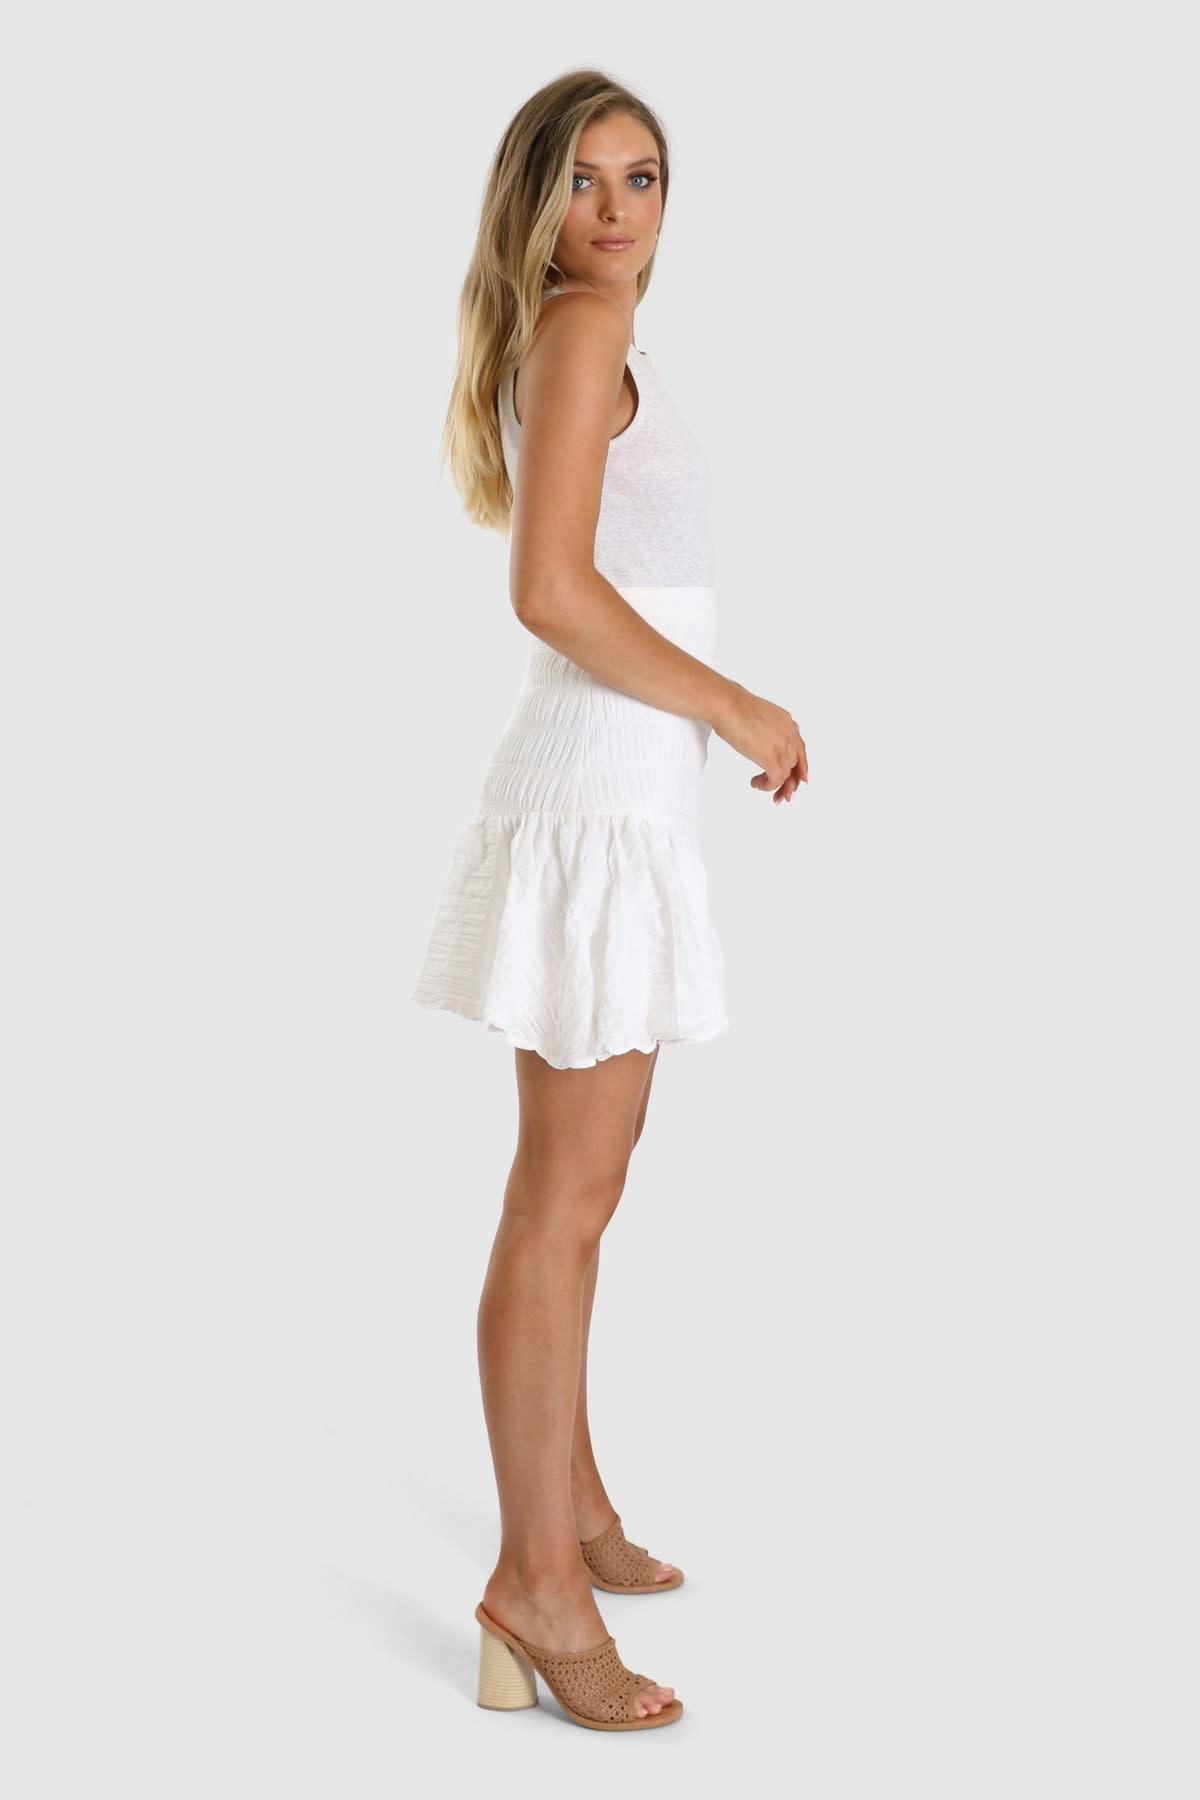 "LOST IN LUNAR LOST IN LUNAR L0190 "" TESSA"" Ruffle Skirt"